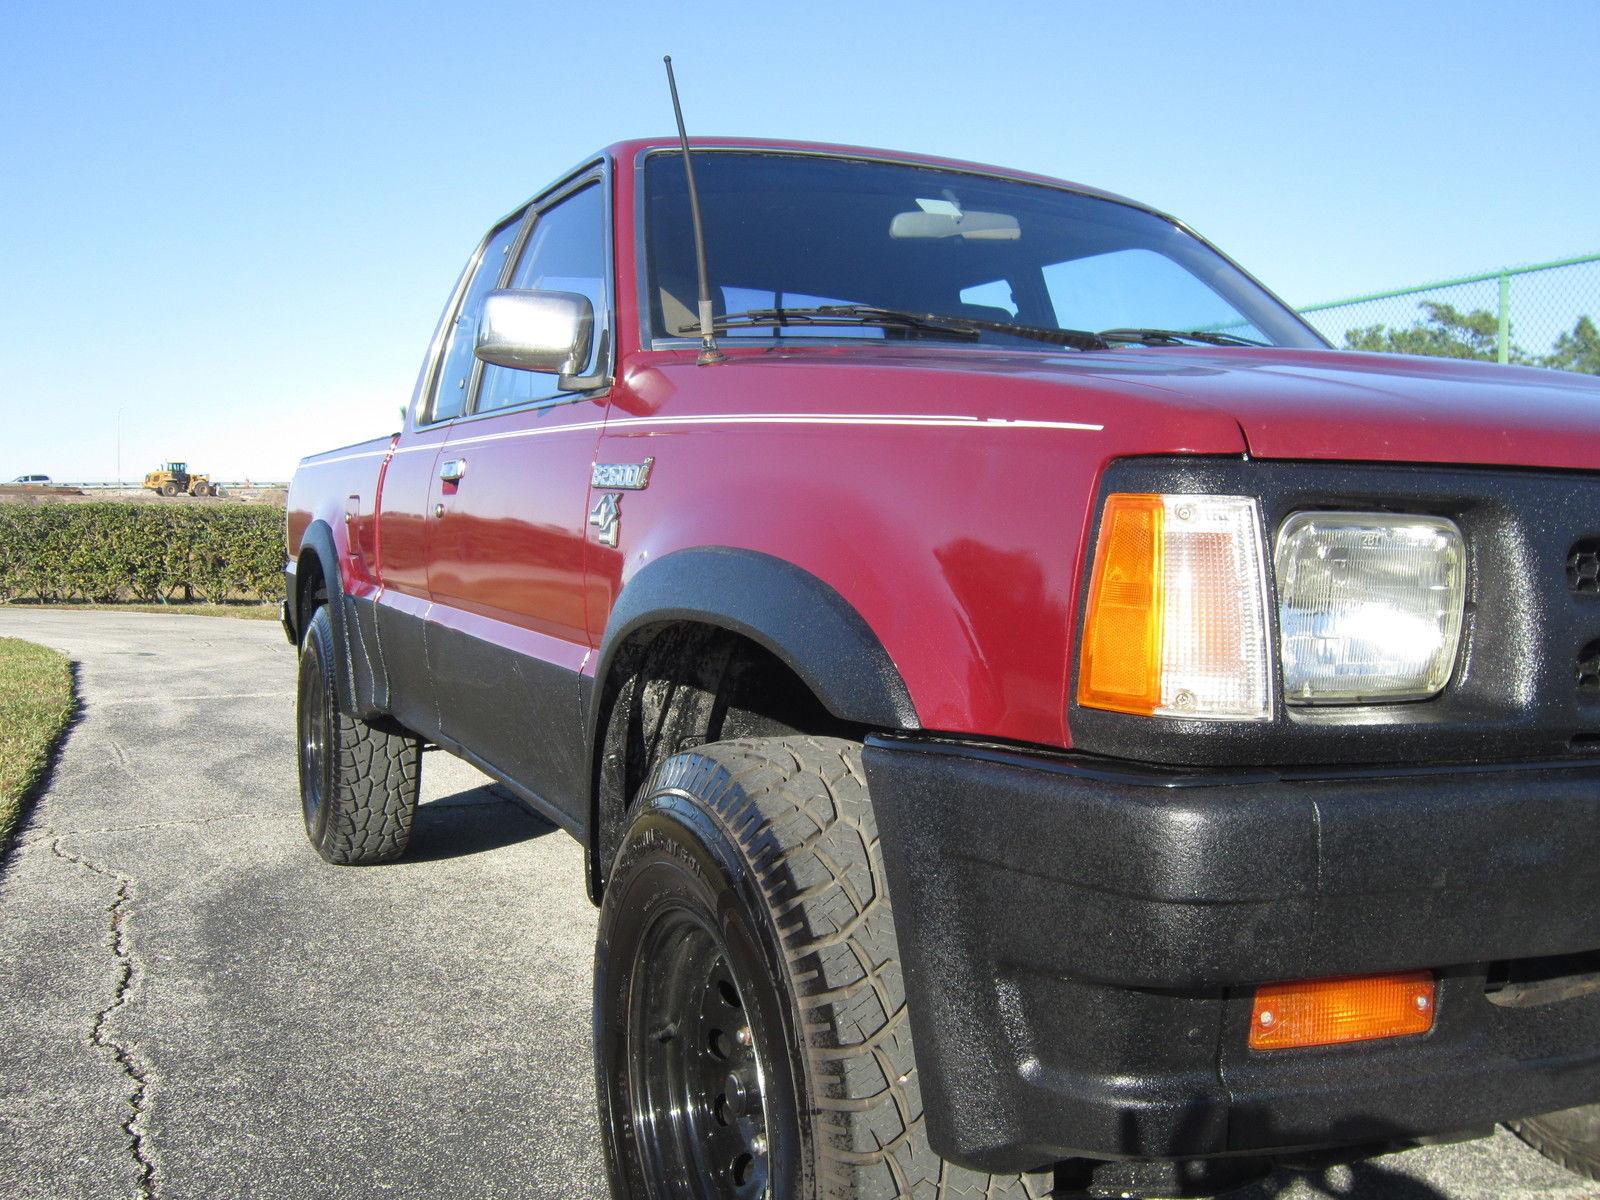 1991 Mazda B2600i 4x4 Efi Fuel Pump